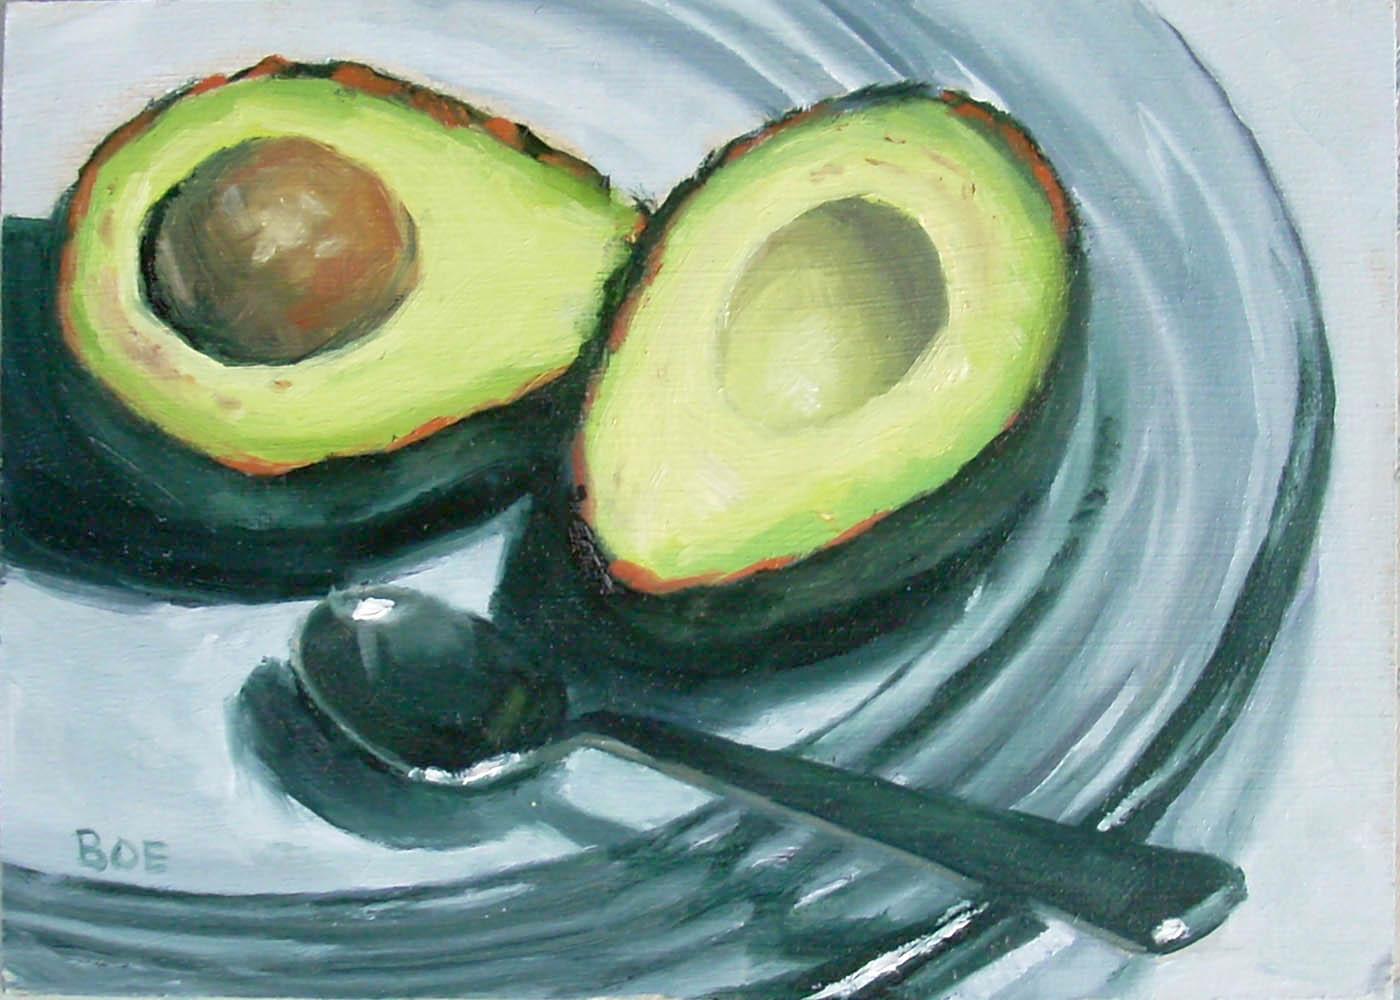 """Avocado On Glass Plate"" original fine art by Karen Boe"